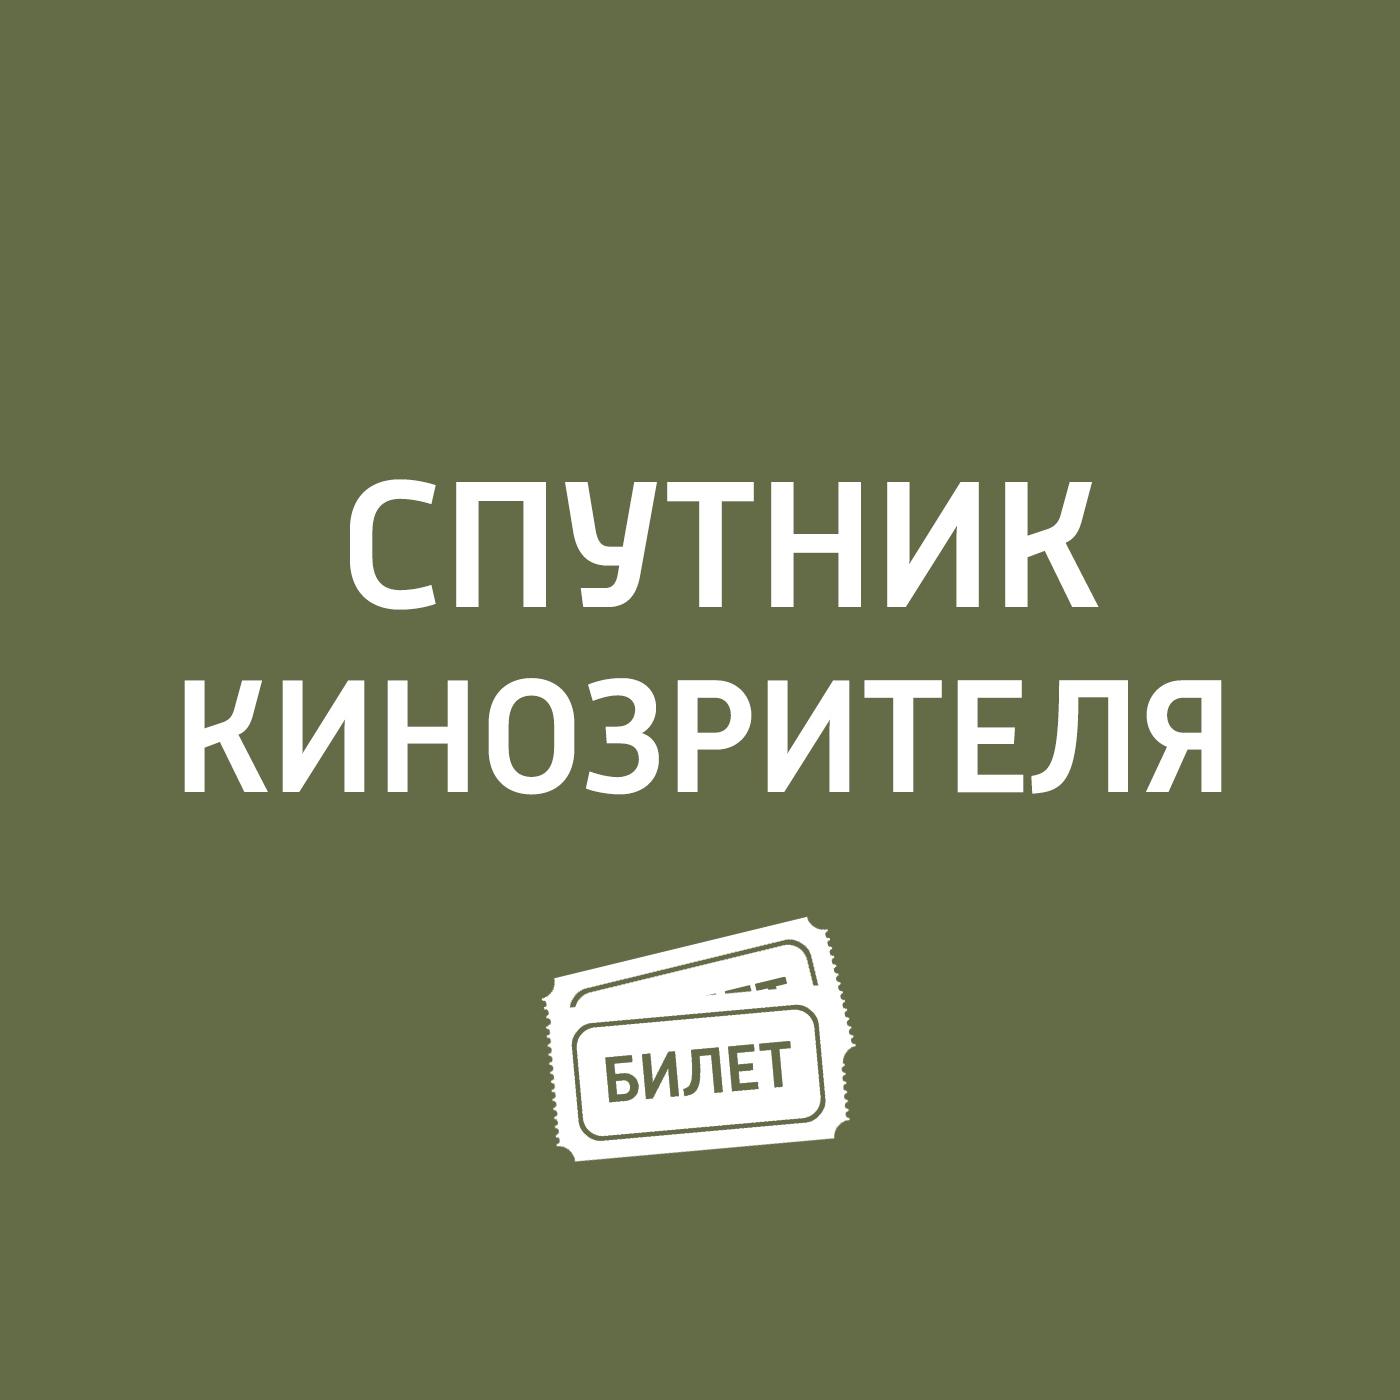 Антон Долин «Хантер Киллер», «Магазинные воришки», «Под Сильвер-Лэйк» и др.